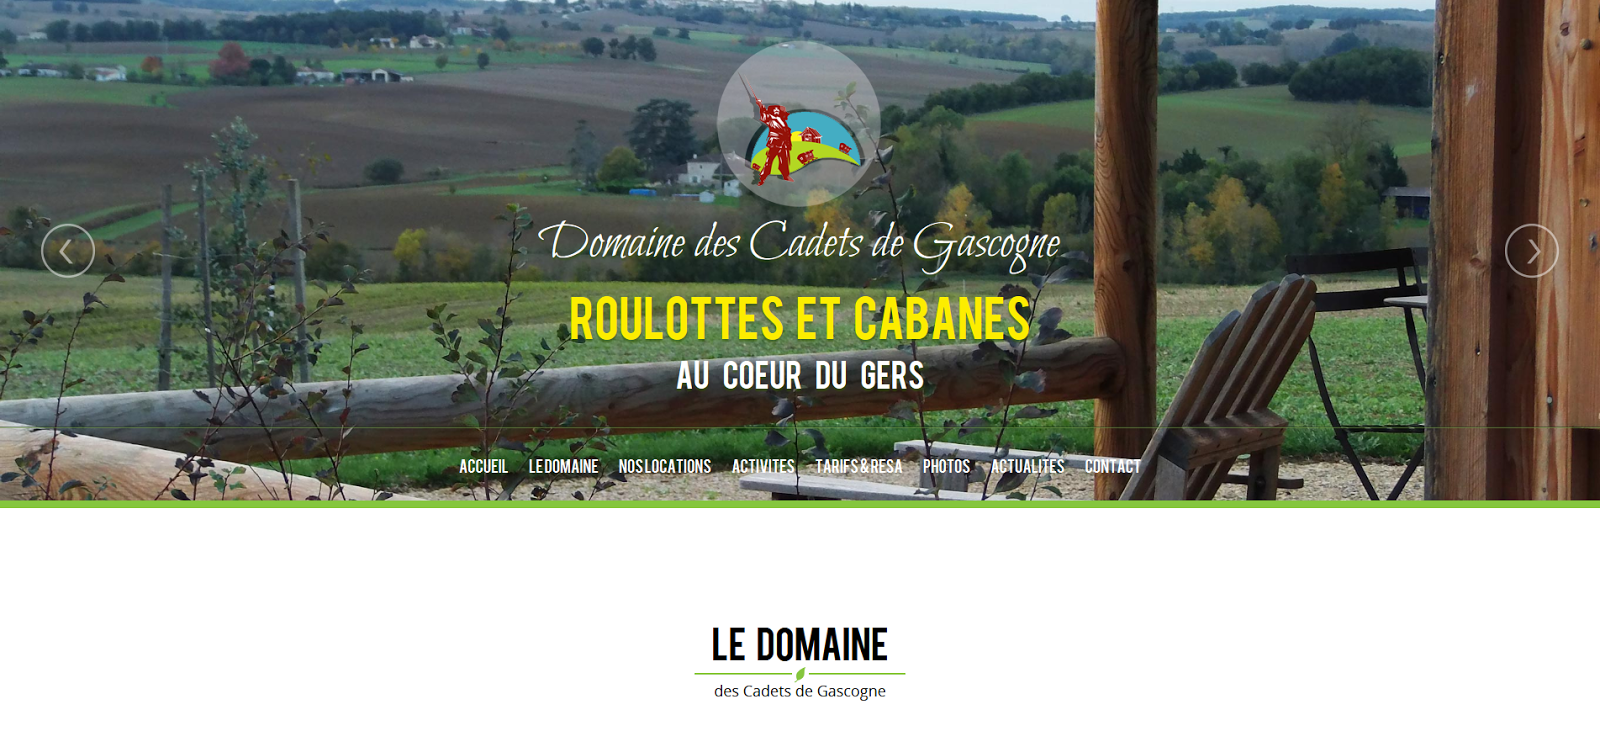 http://www.domaine-cadets-gascogne.com/